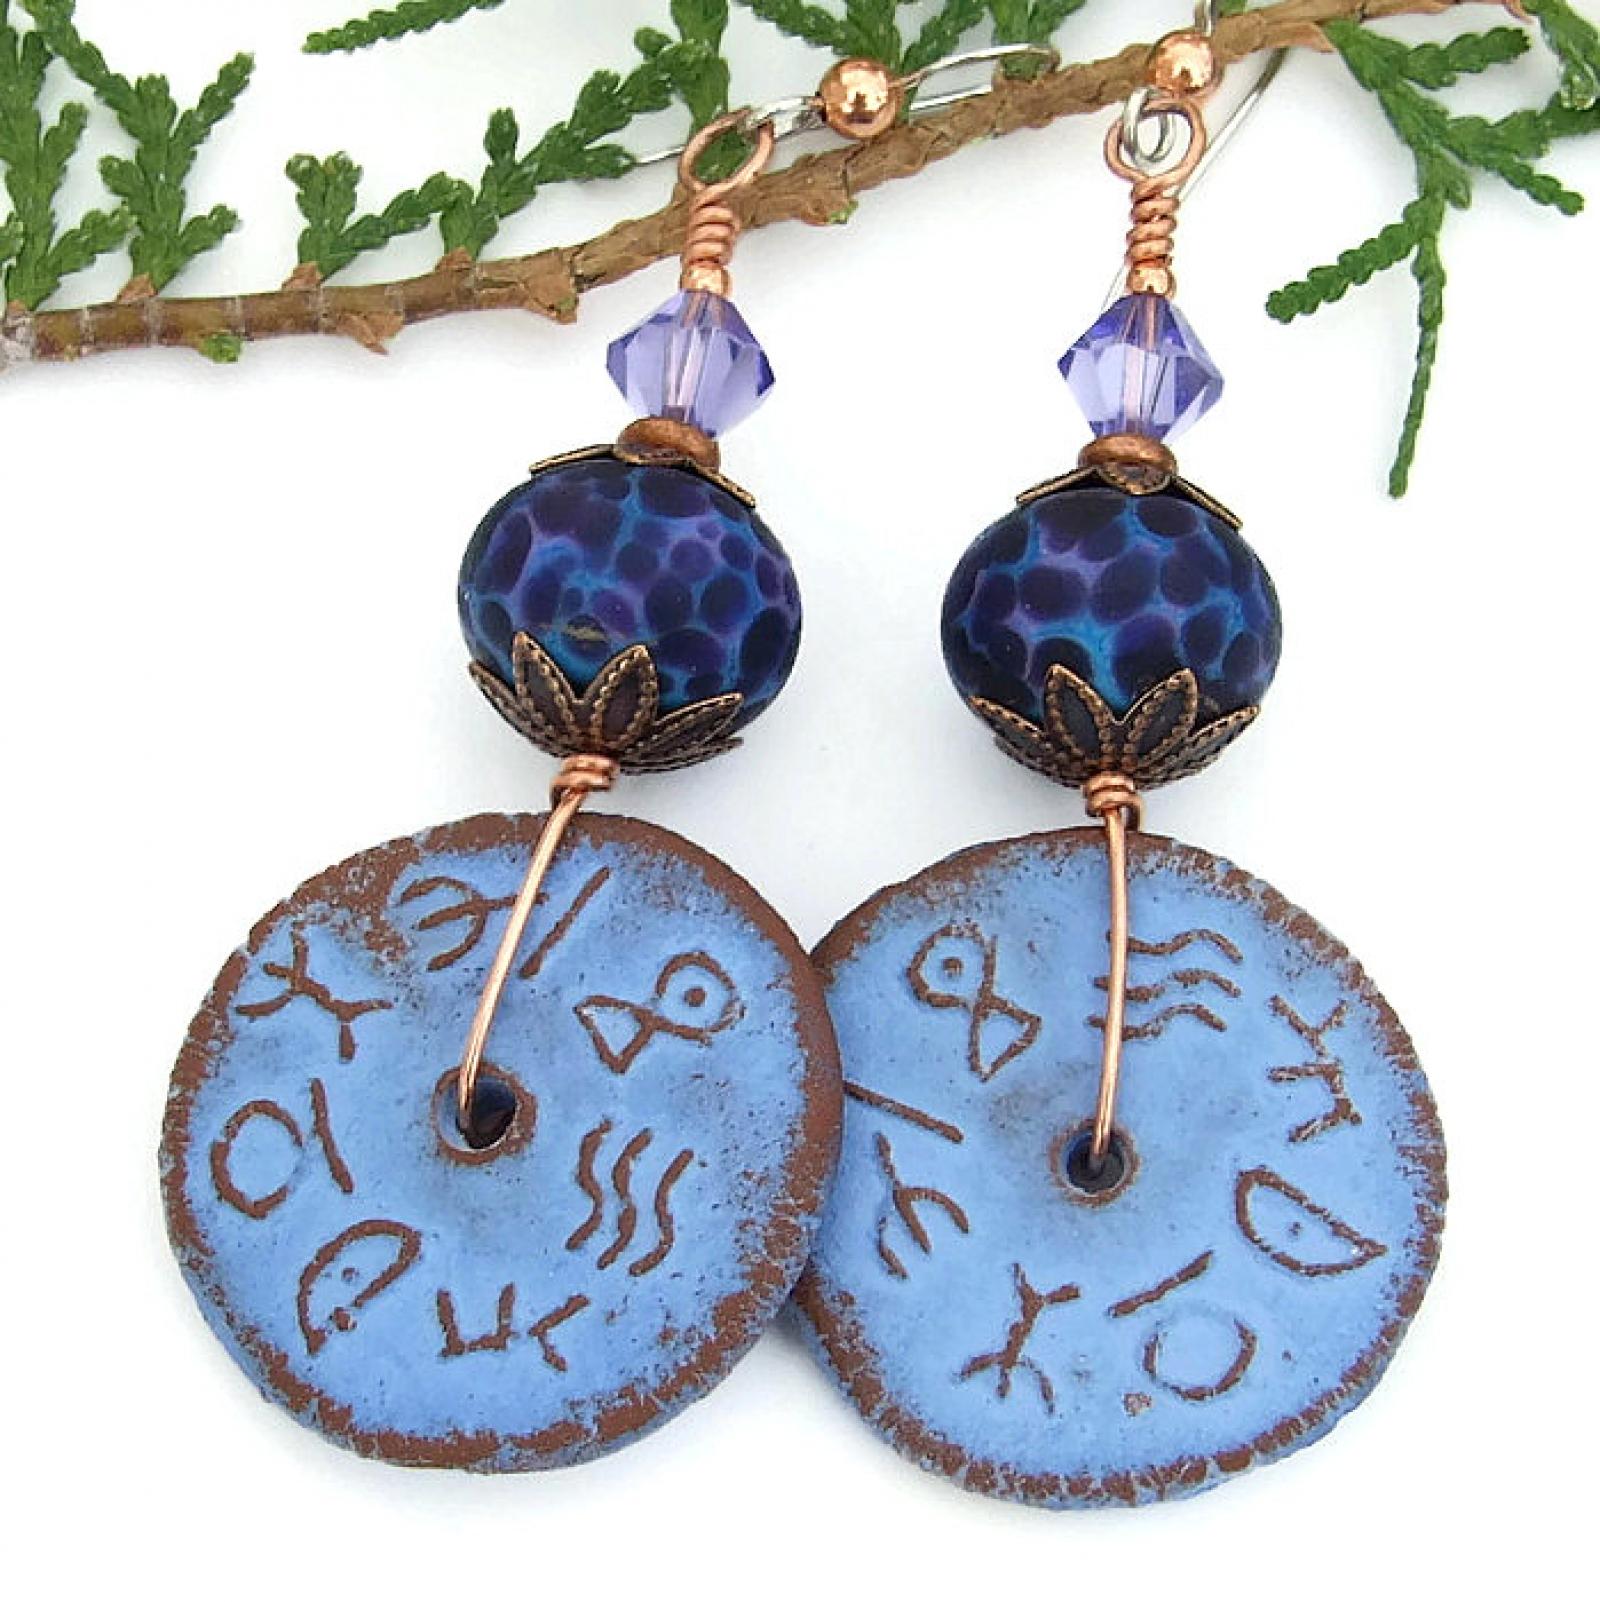 Rustic Runes Handmade Earrings, Ceramic Purple Lampwork Jewelry ...